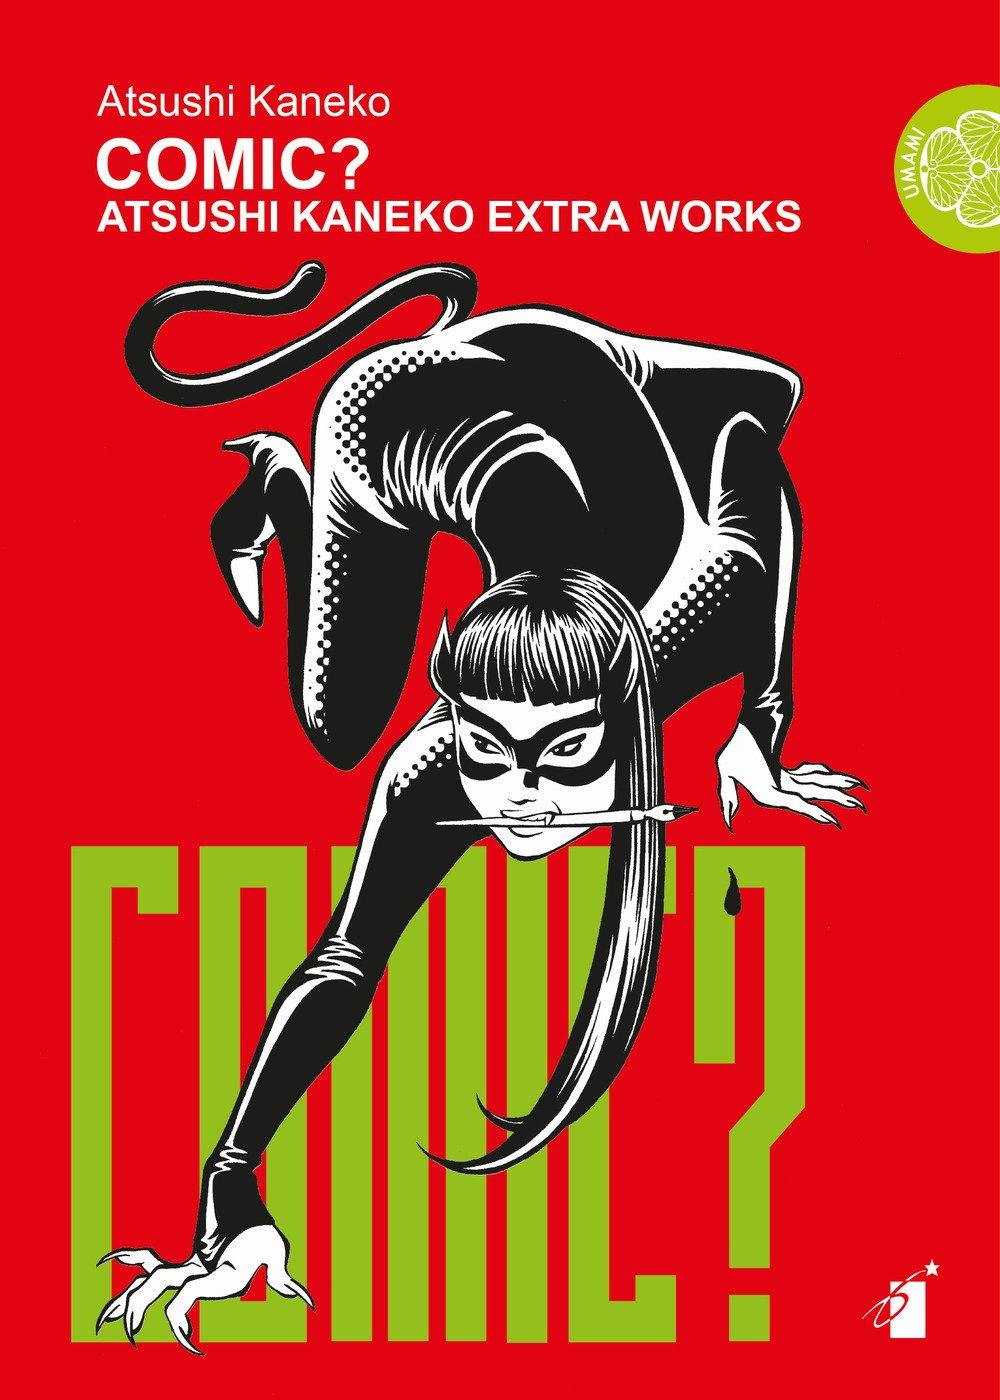 Atsushi Kaneko extra works (Umami): Amazon.es: Atsushi Kaneko, Y. Yaeka: Libros en idiomas extranjeros